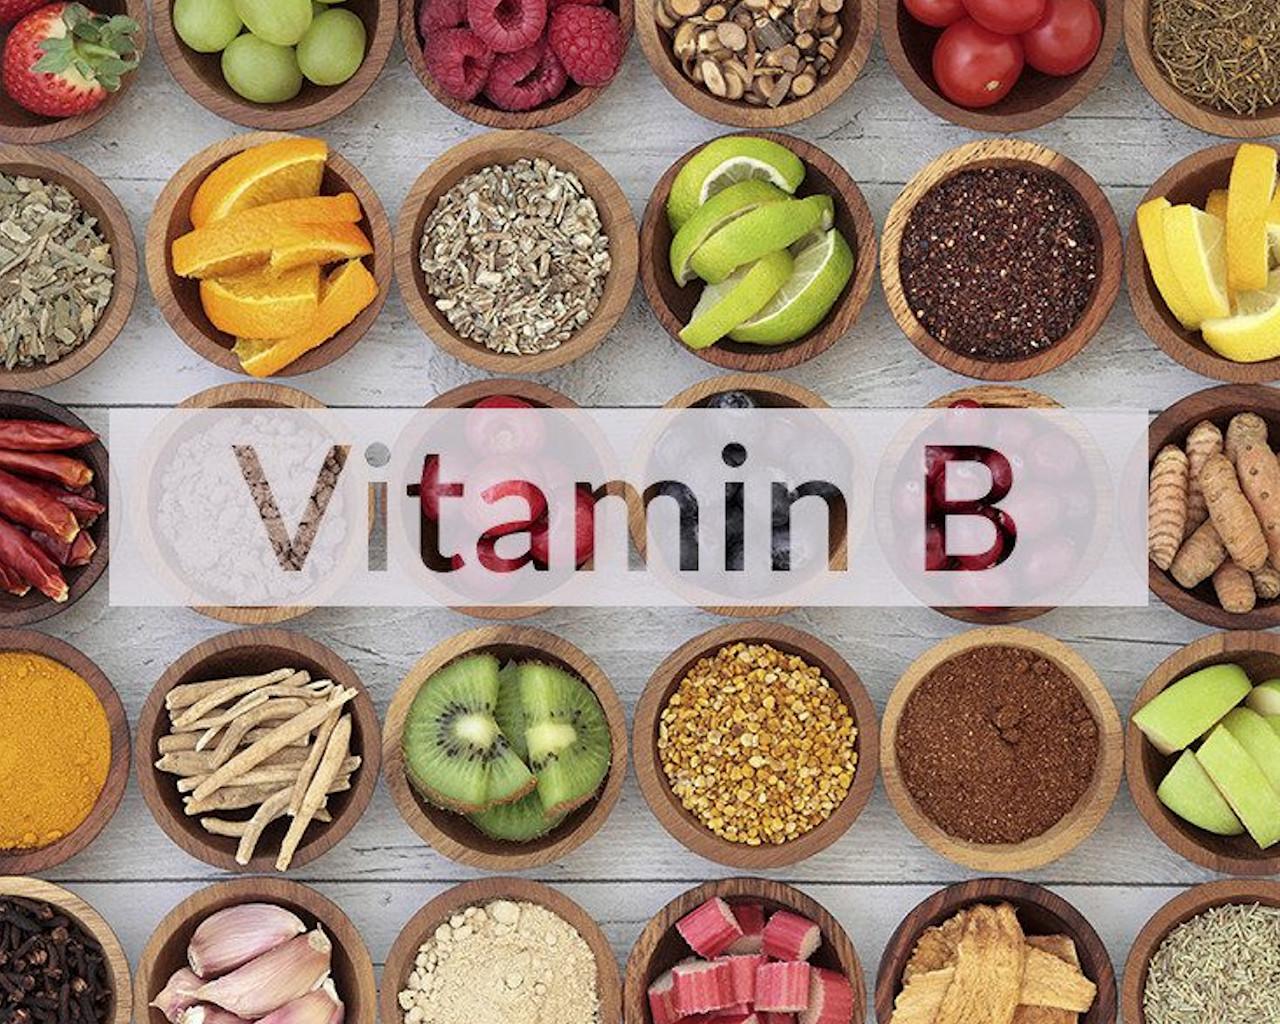 βιταμινη β,βιταμινη β1,βιταμινη β τροφεσ,βιταμινη β12 που βοηθαει,βιταμινη β12,βιταμίνη β12 τροφέσ,βιταμινη β12 παρενεργειεσ,βιταμινη β12 τιμεσ